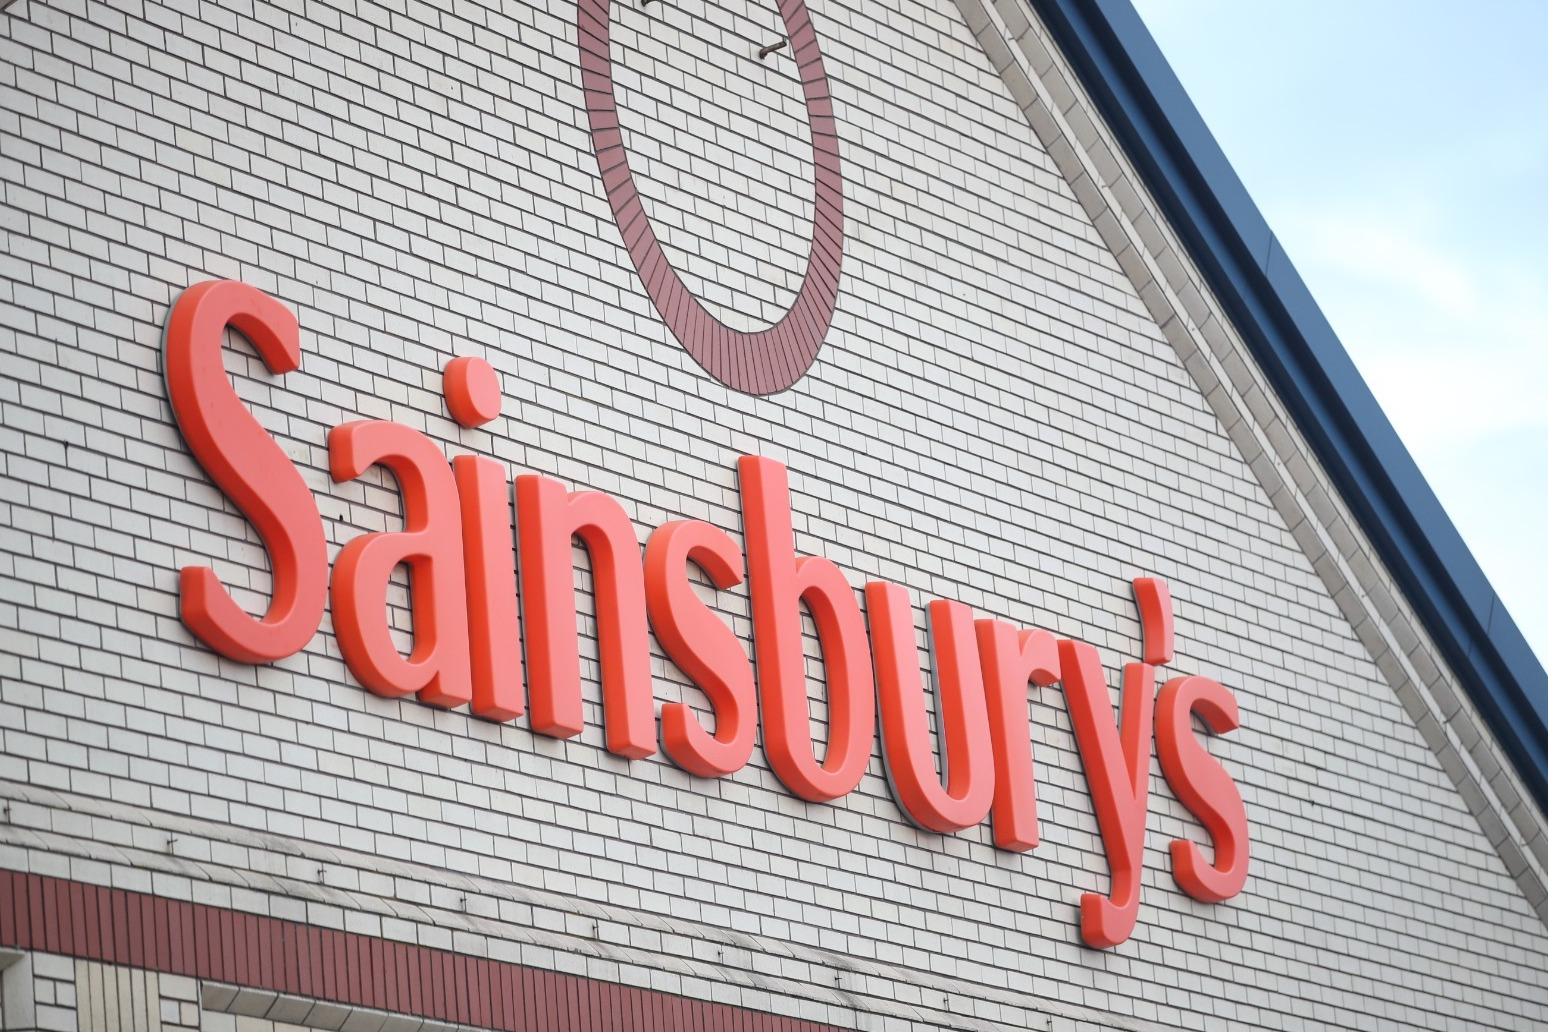 Sainsbury's bids to recruit 22,000 staff for Christmas season